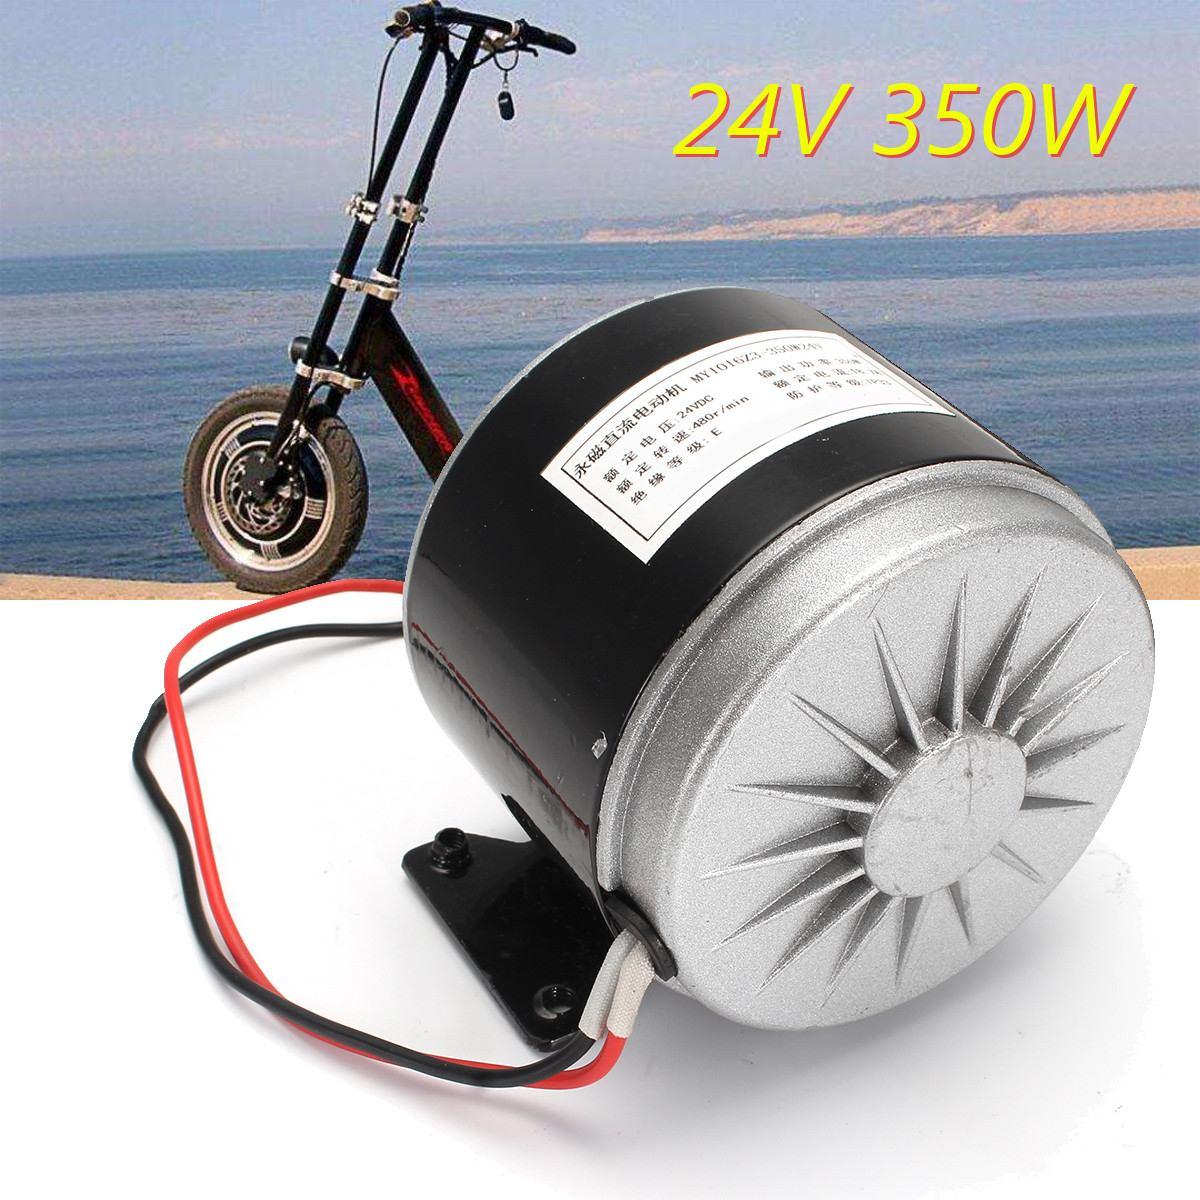 MY1016 مجموعة محرك كهربائي 24 فولت تيار مستمر 350 واط للدراجة الكهربائية ، محرك ناعم للدراجة الكهربائية ، ZY1016